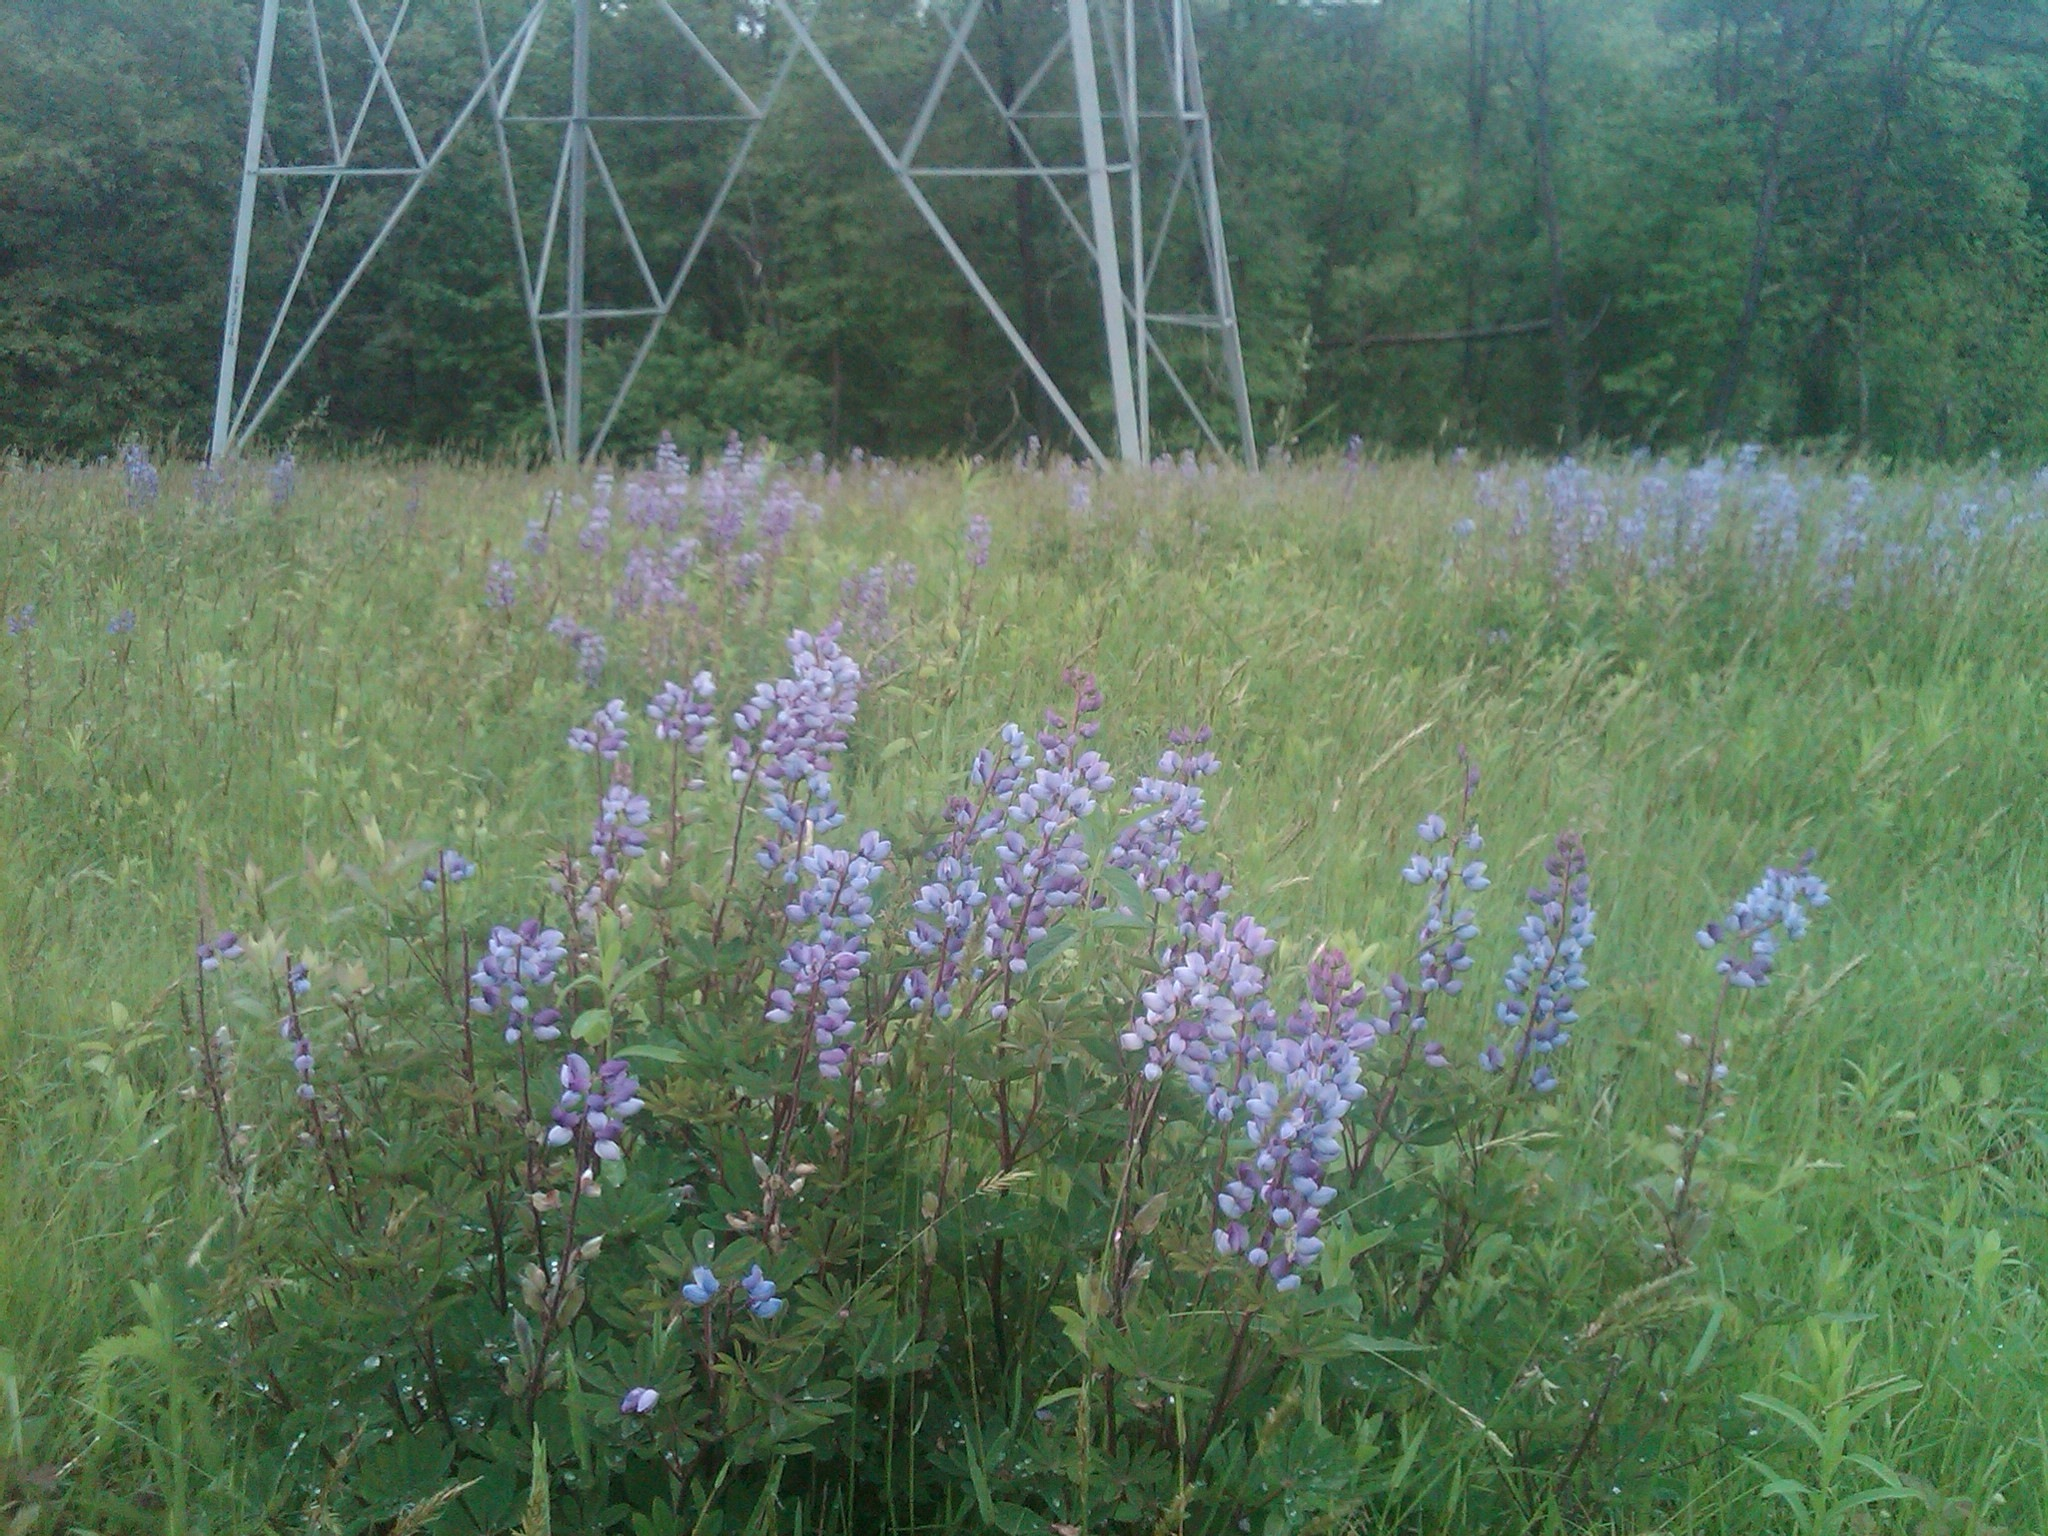 Thunder Bay Field Naturalists presents Susan Meads, Integrated Vegetation Management Expert